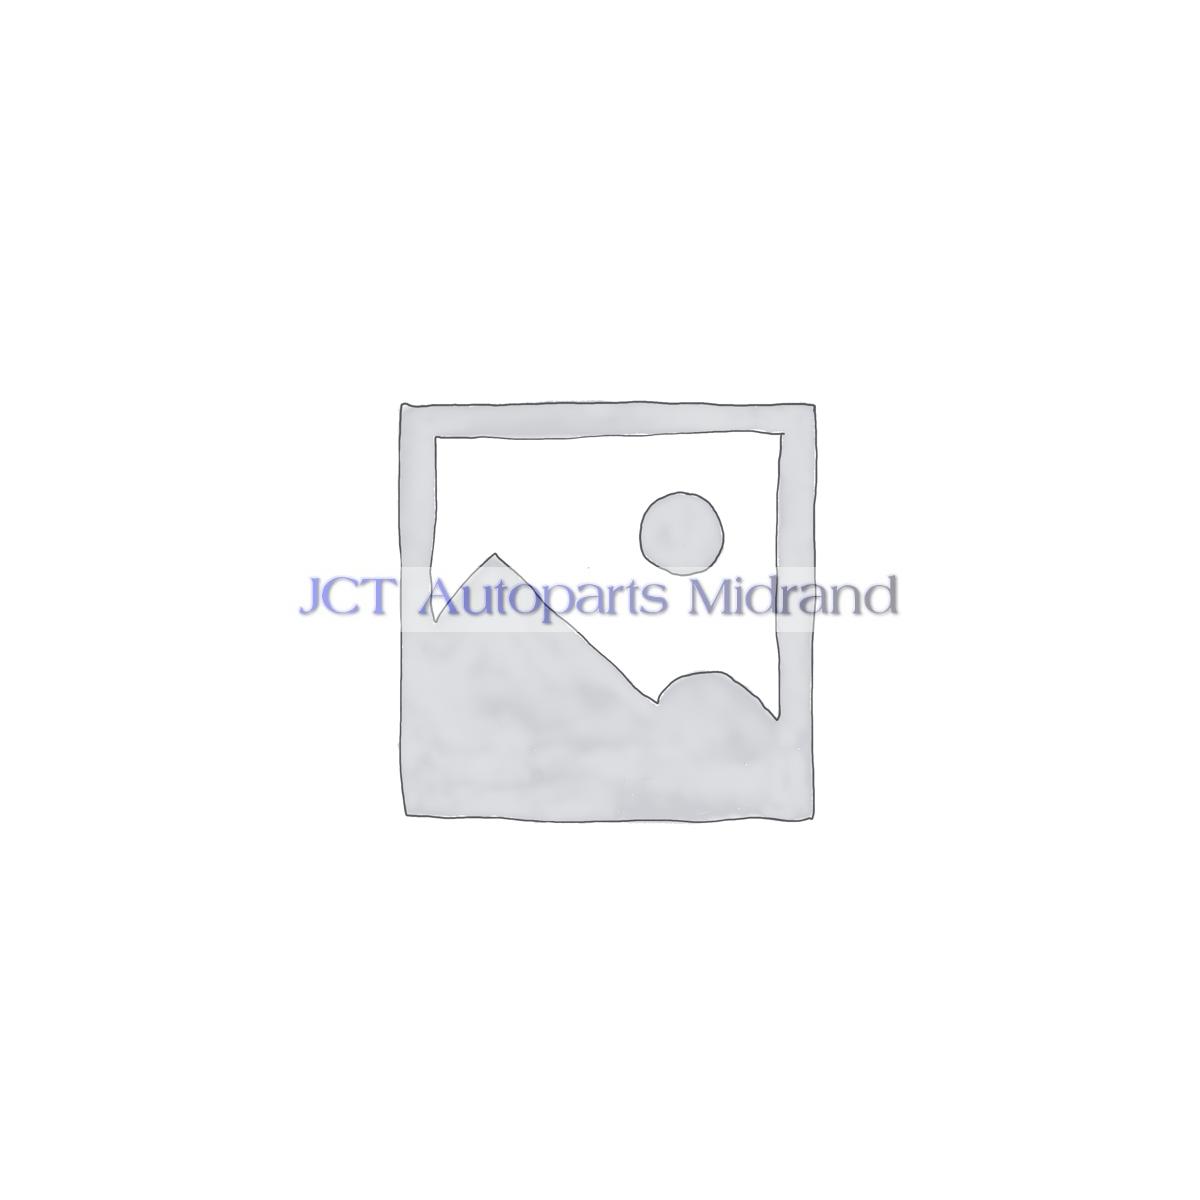 Jetta 6 (preface lift)